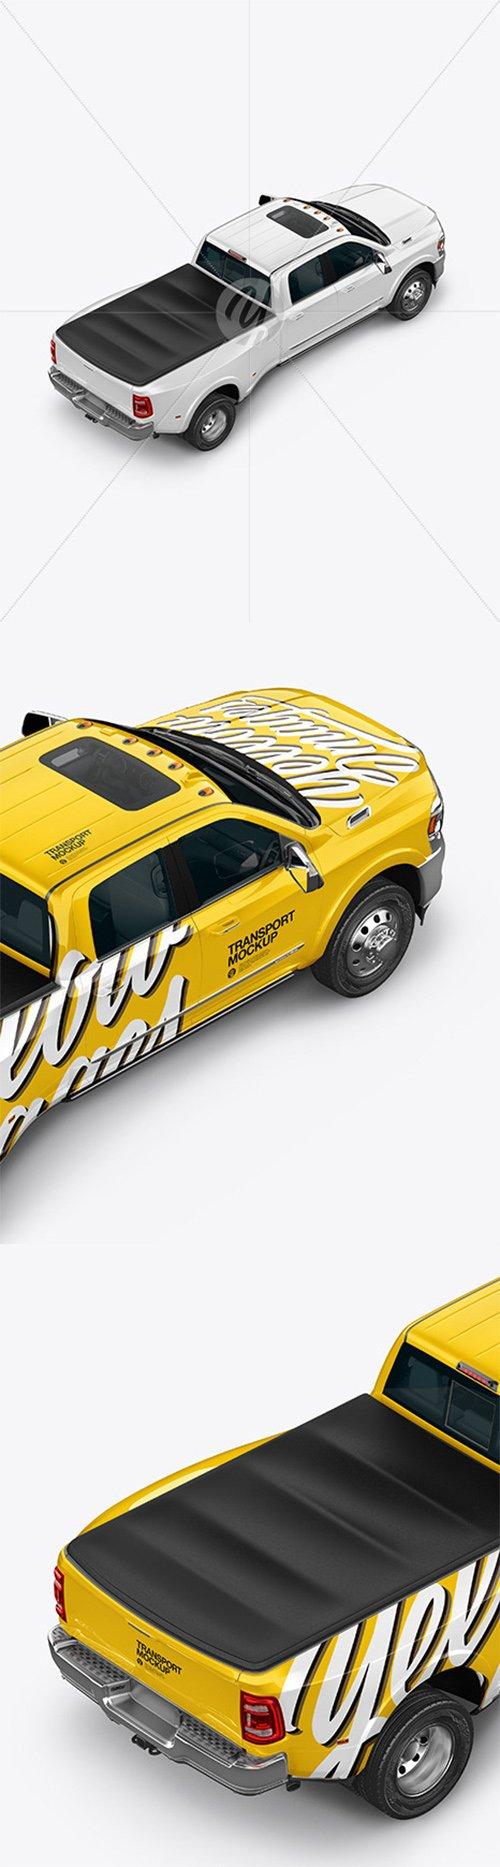 Pickup Truck Mockup - Back Half Side View 64211